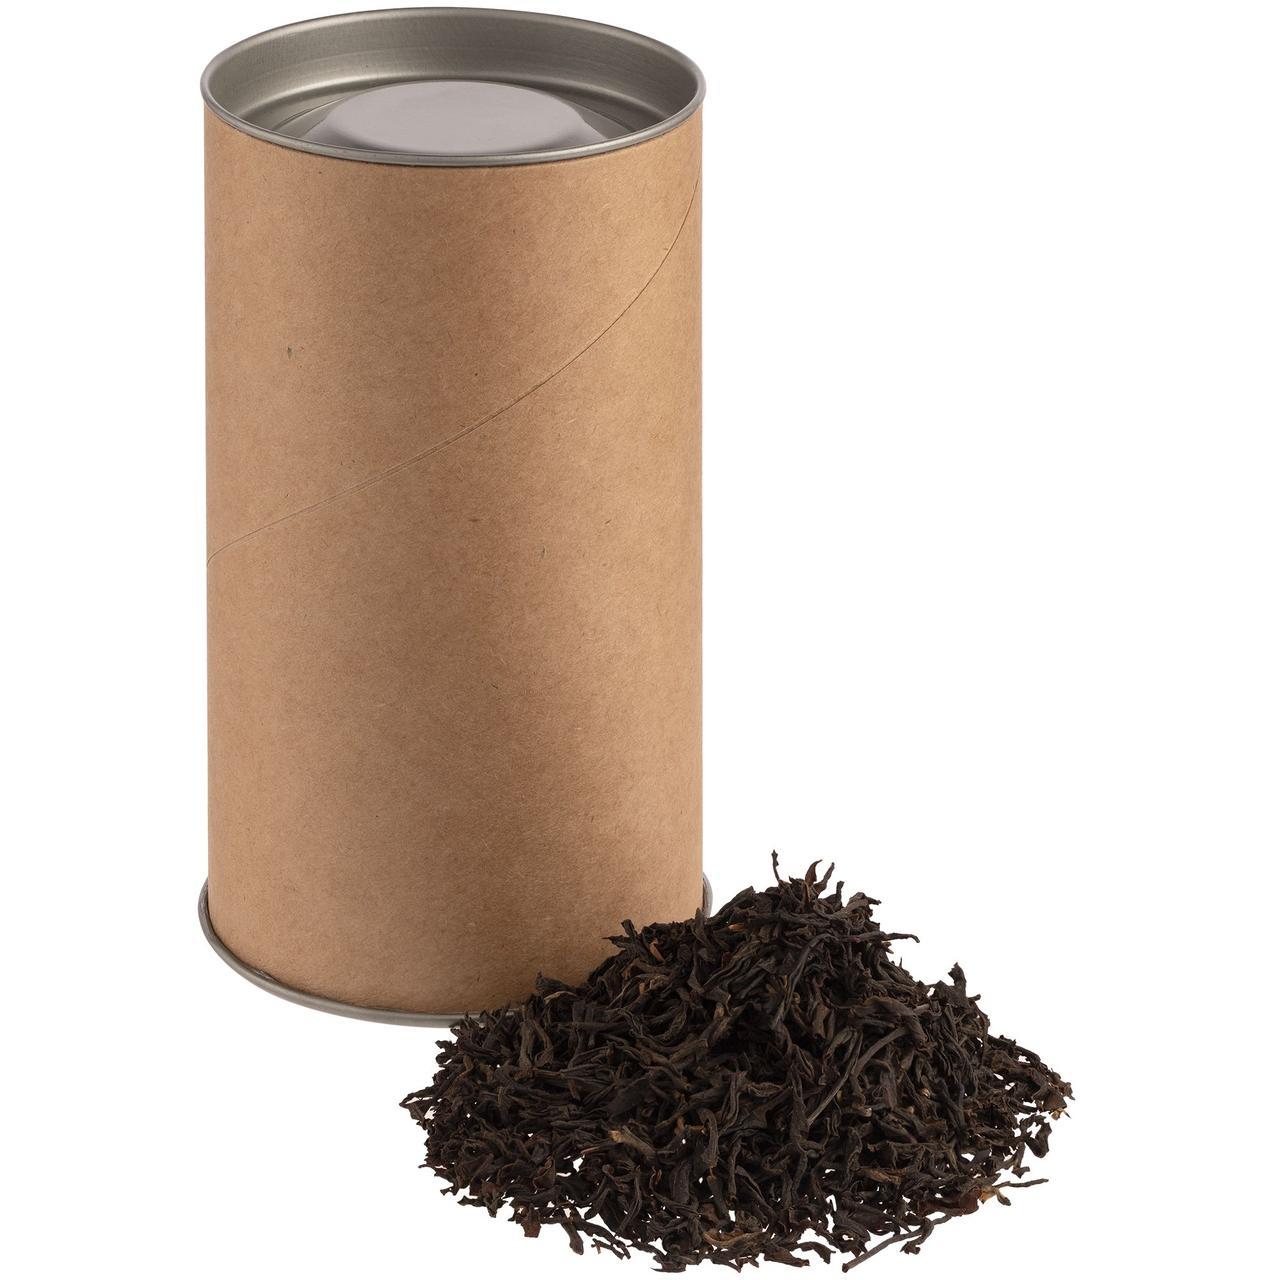 Чай Breakfast Tea в тубусе, крафт (артикул 12458.00)